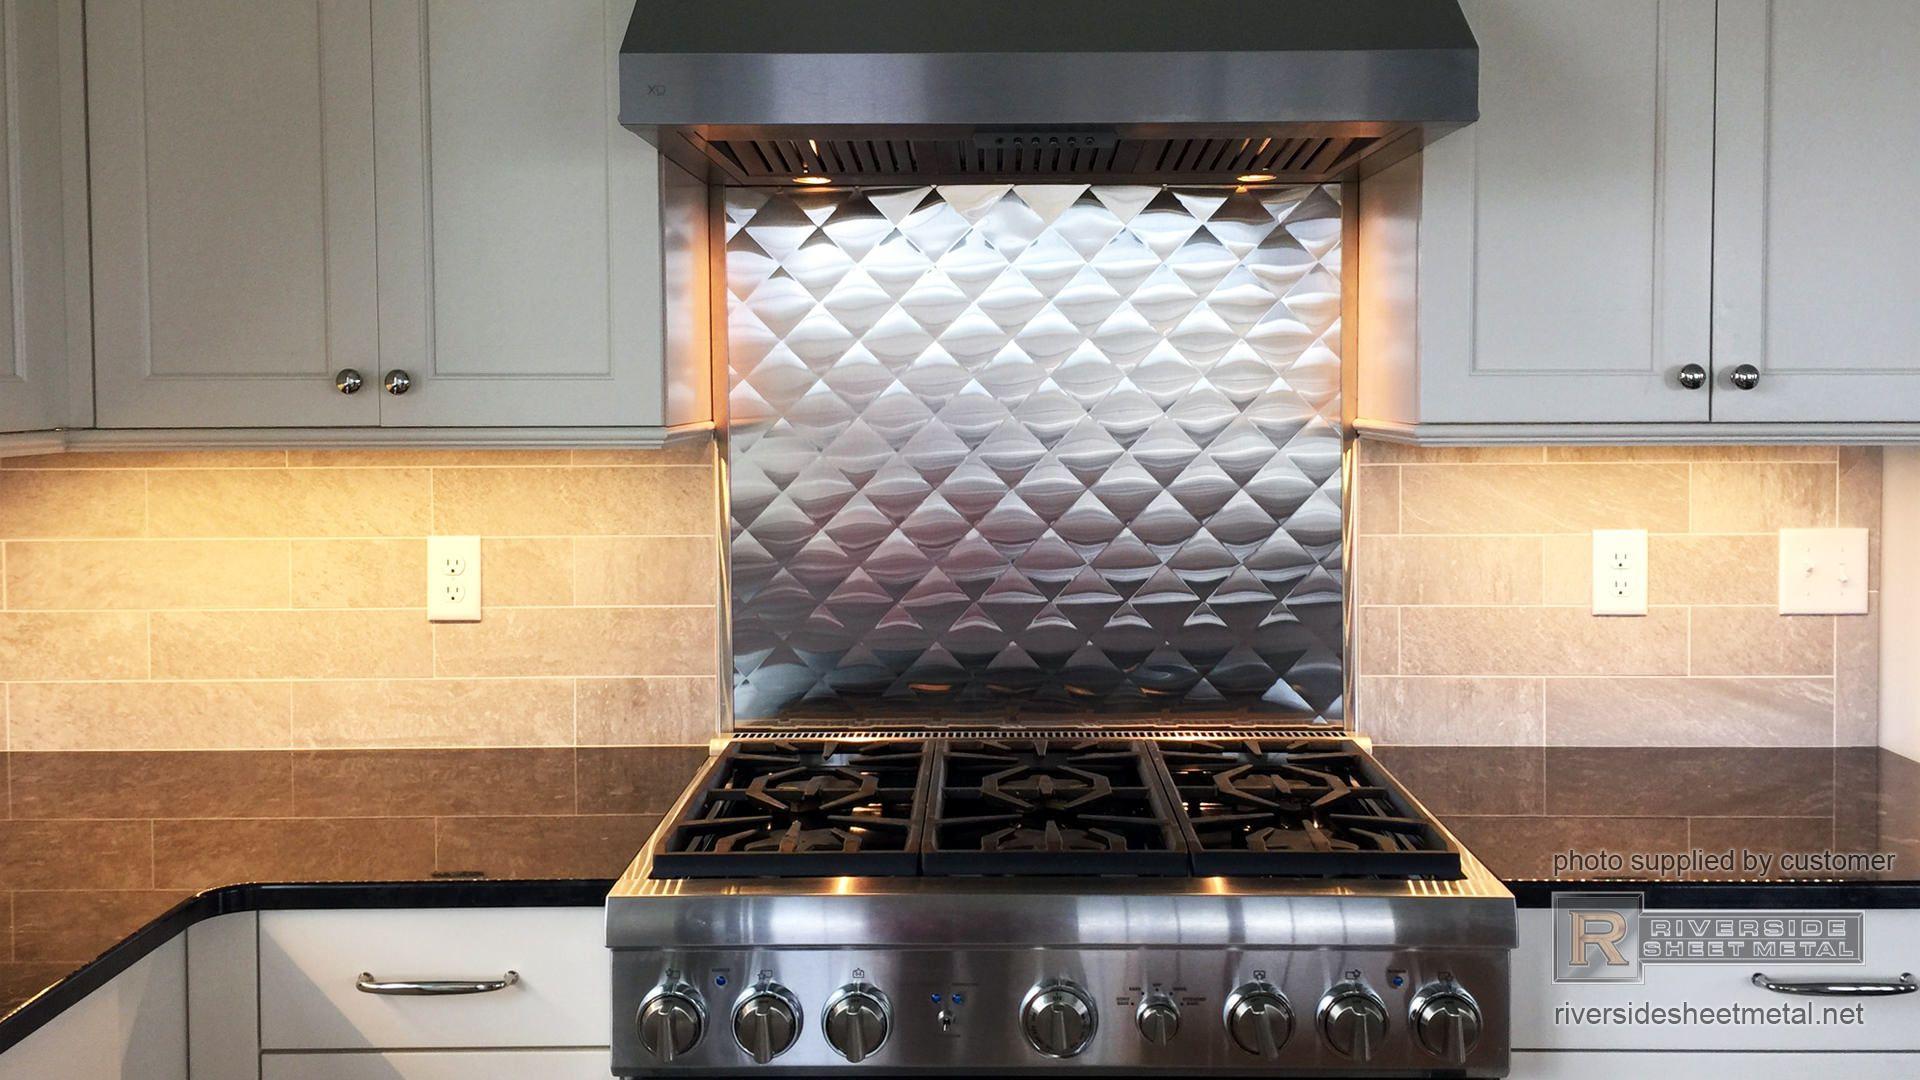 - Quilted Diamond Stainless Steel Back Splash Installation Steel